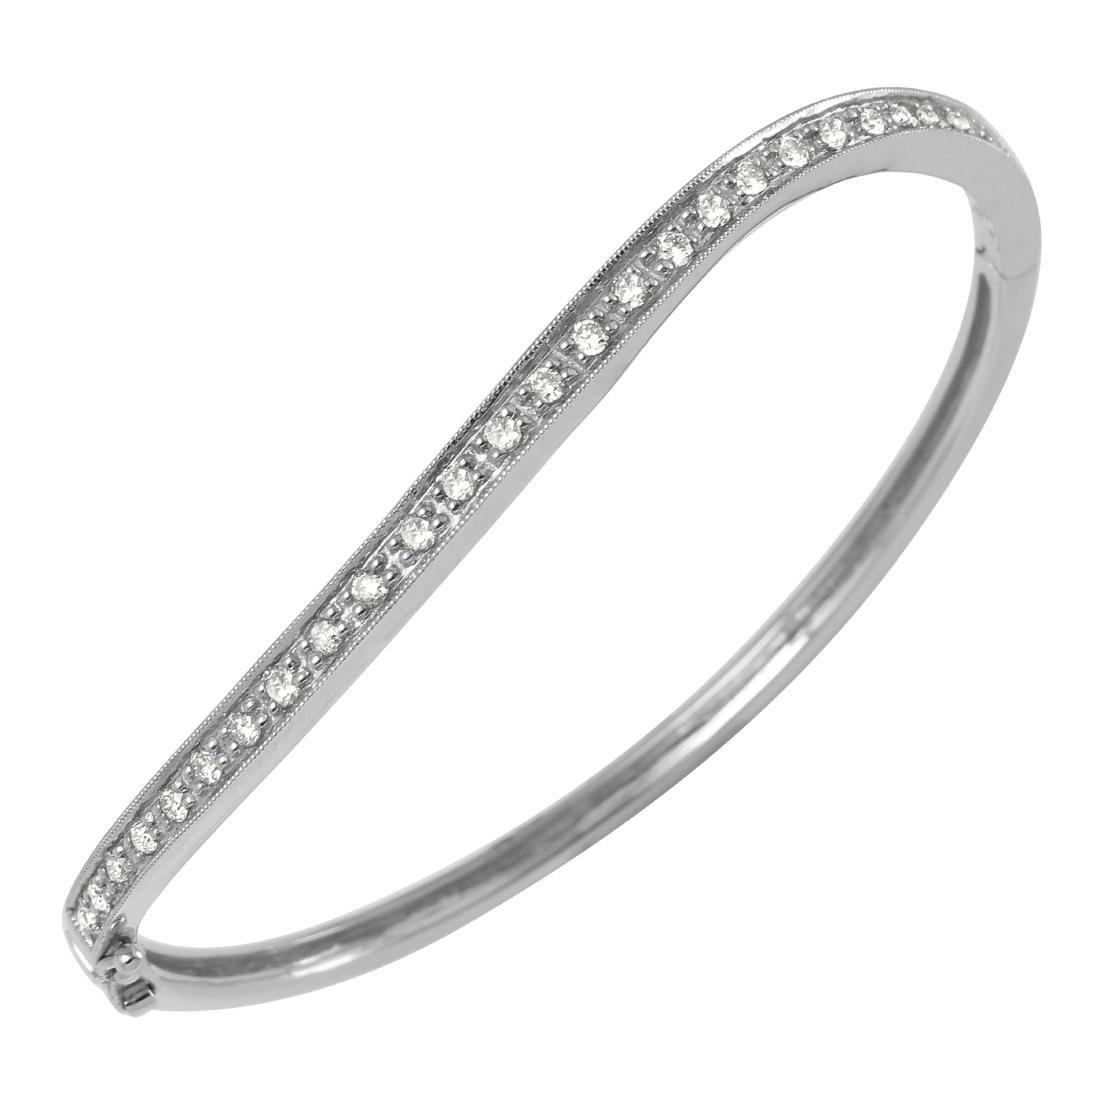 14KT White Gold Diamond Bangle Bracelet - 4